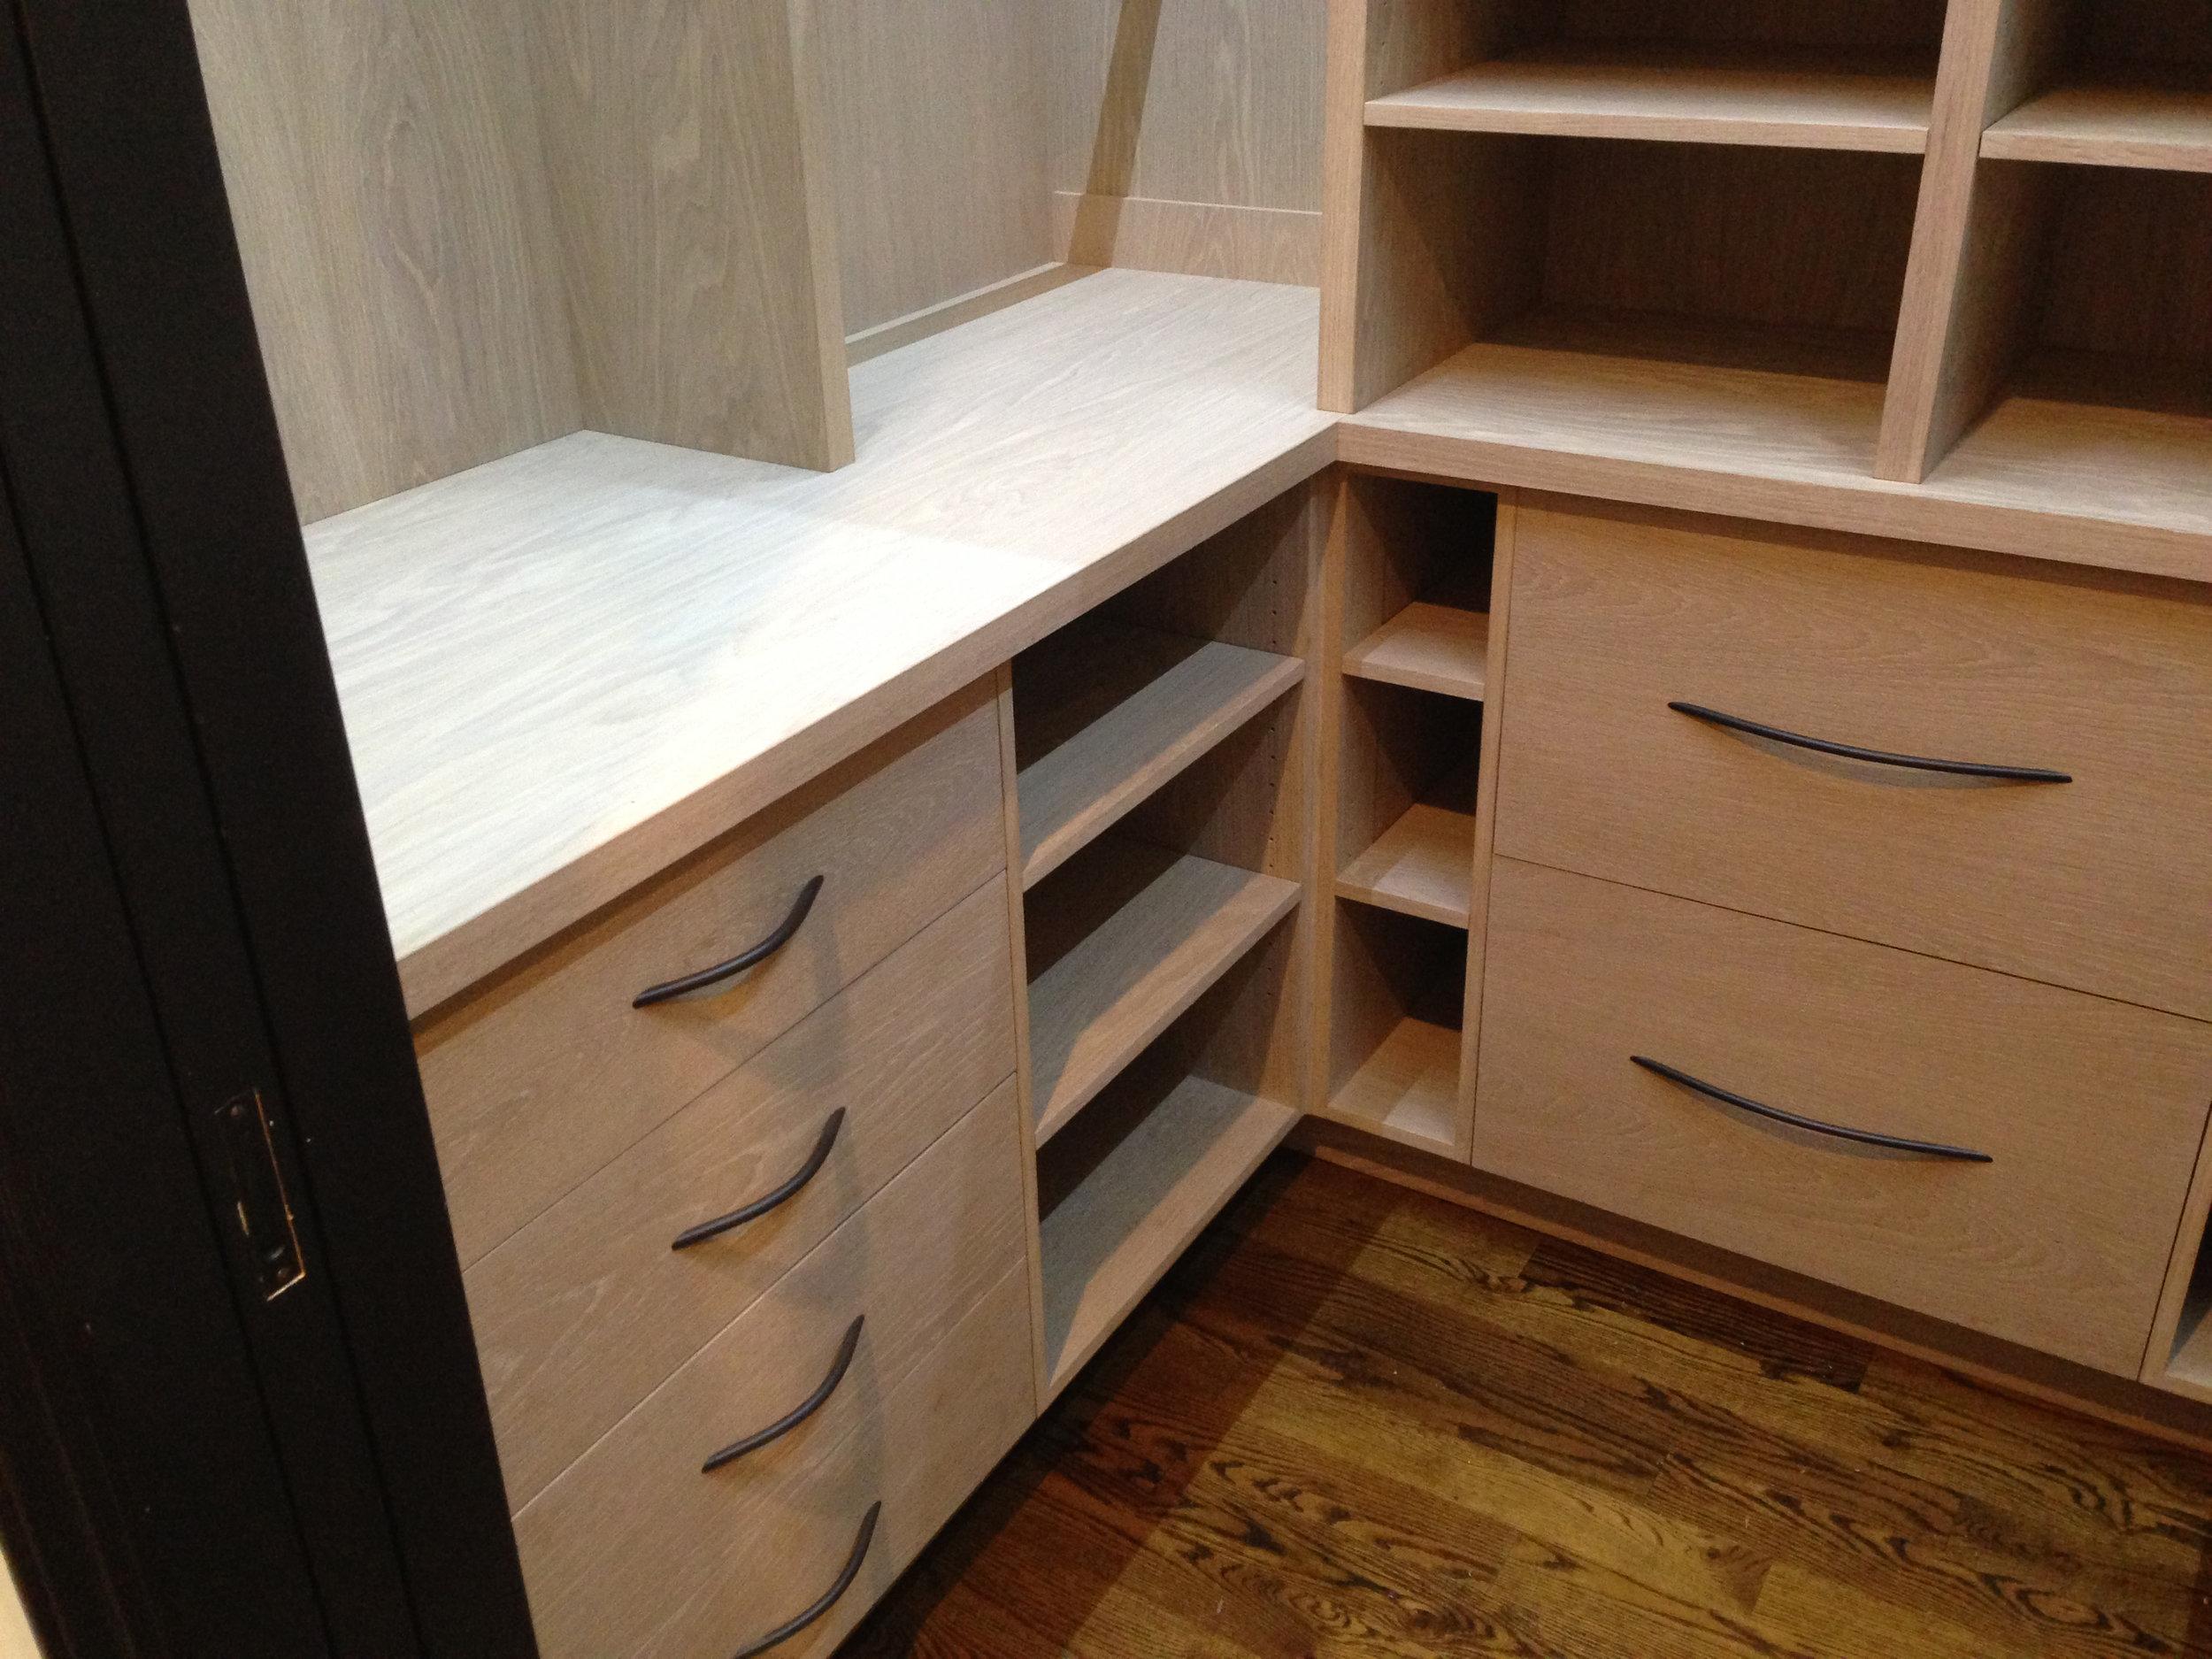 White-Oak-Closet-with-custom-drawers-and-shelves.jpg